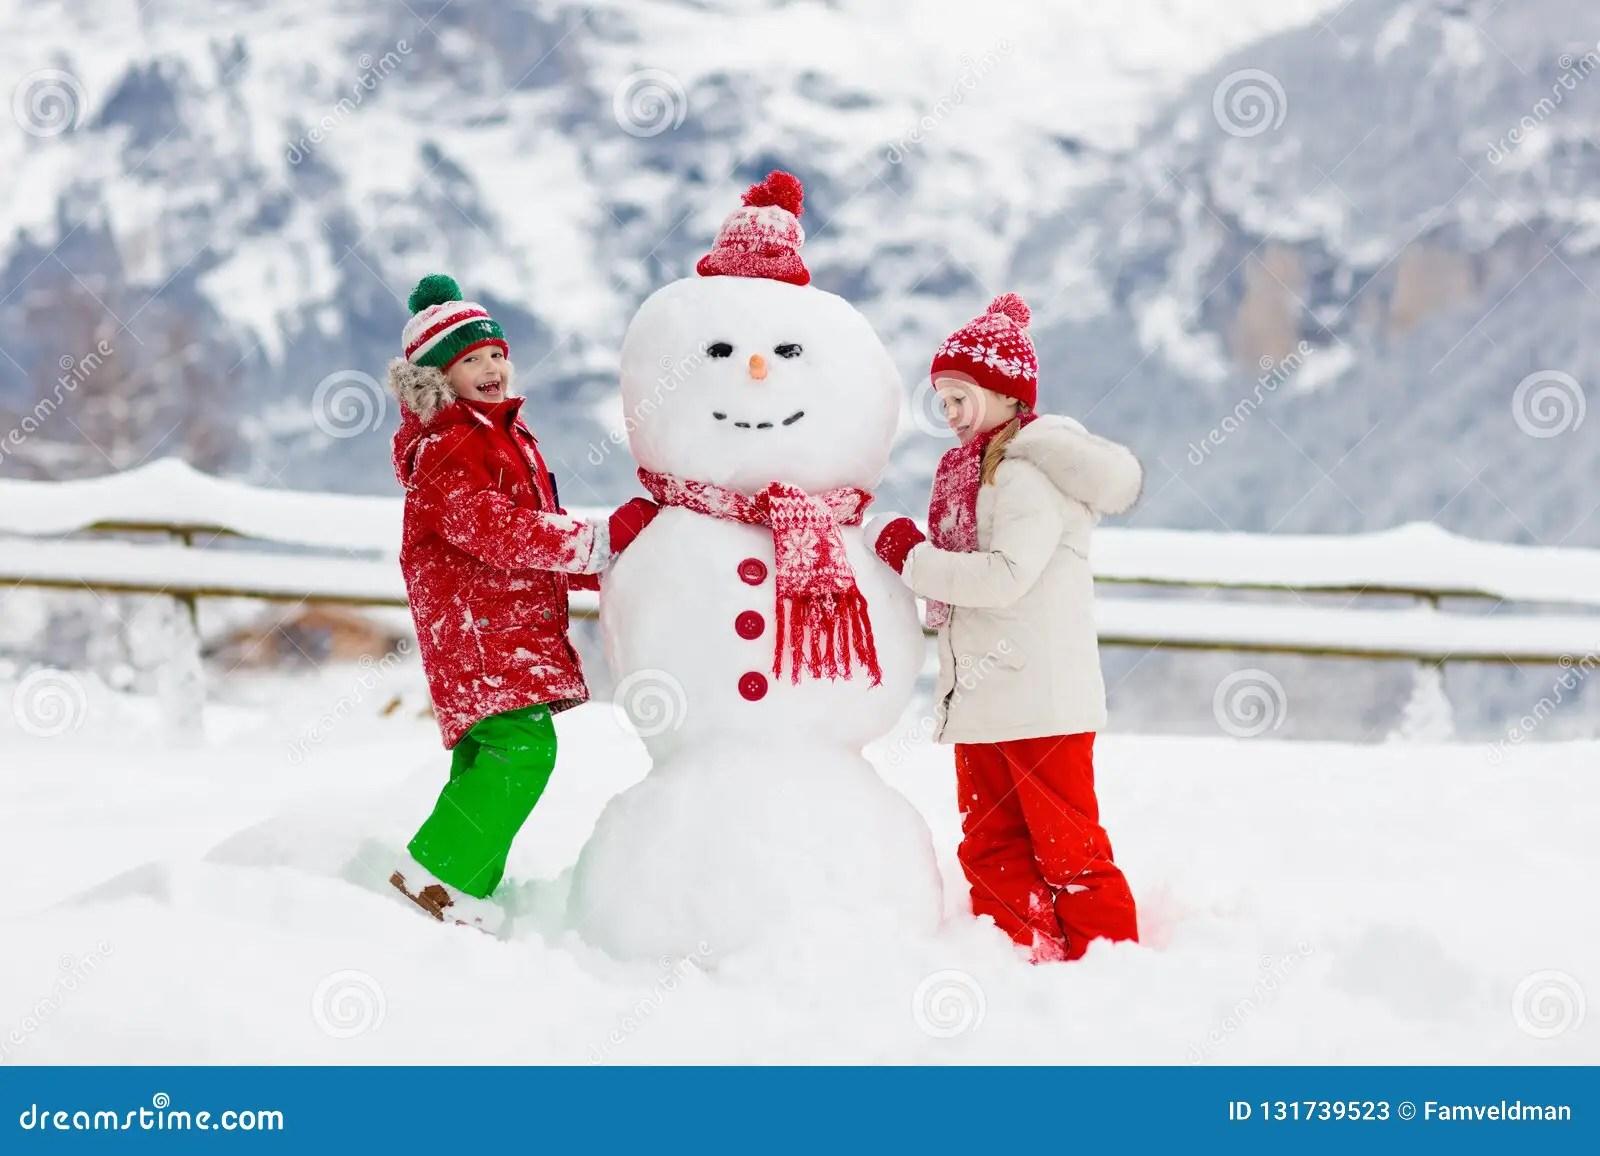 Child Building Snowman Kids Build Snow Man Boy And Girl